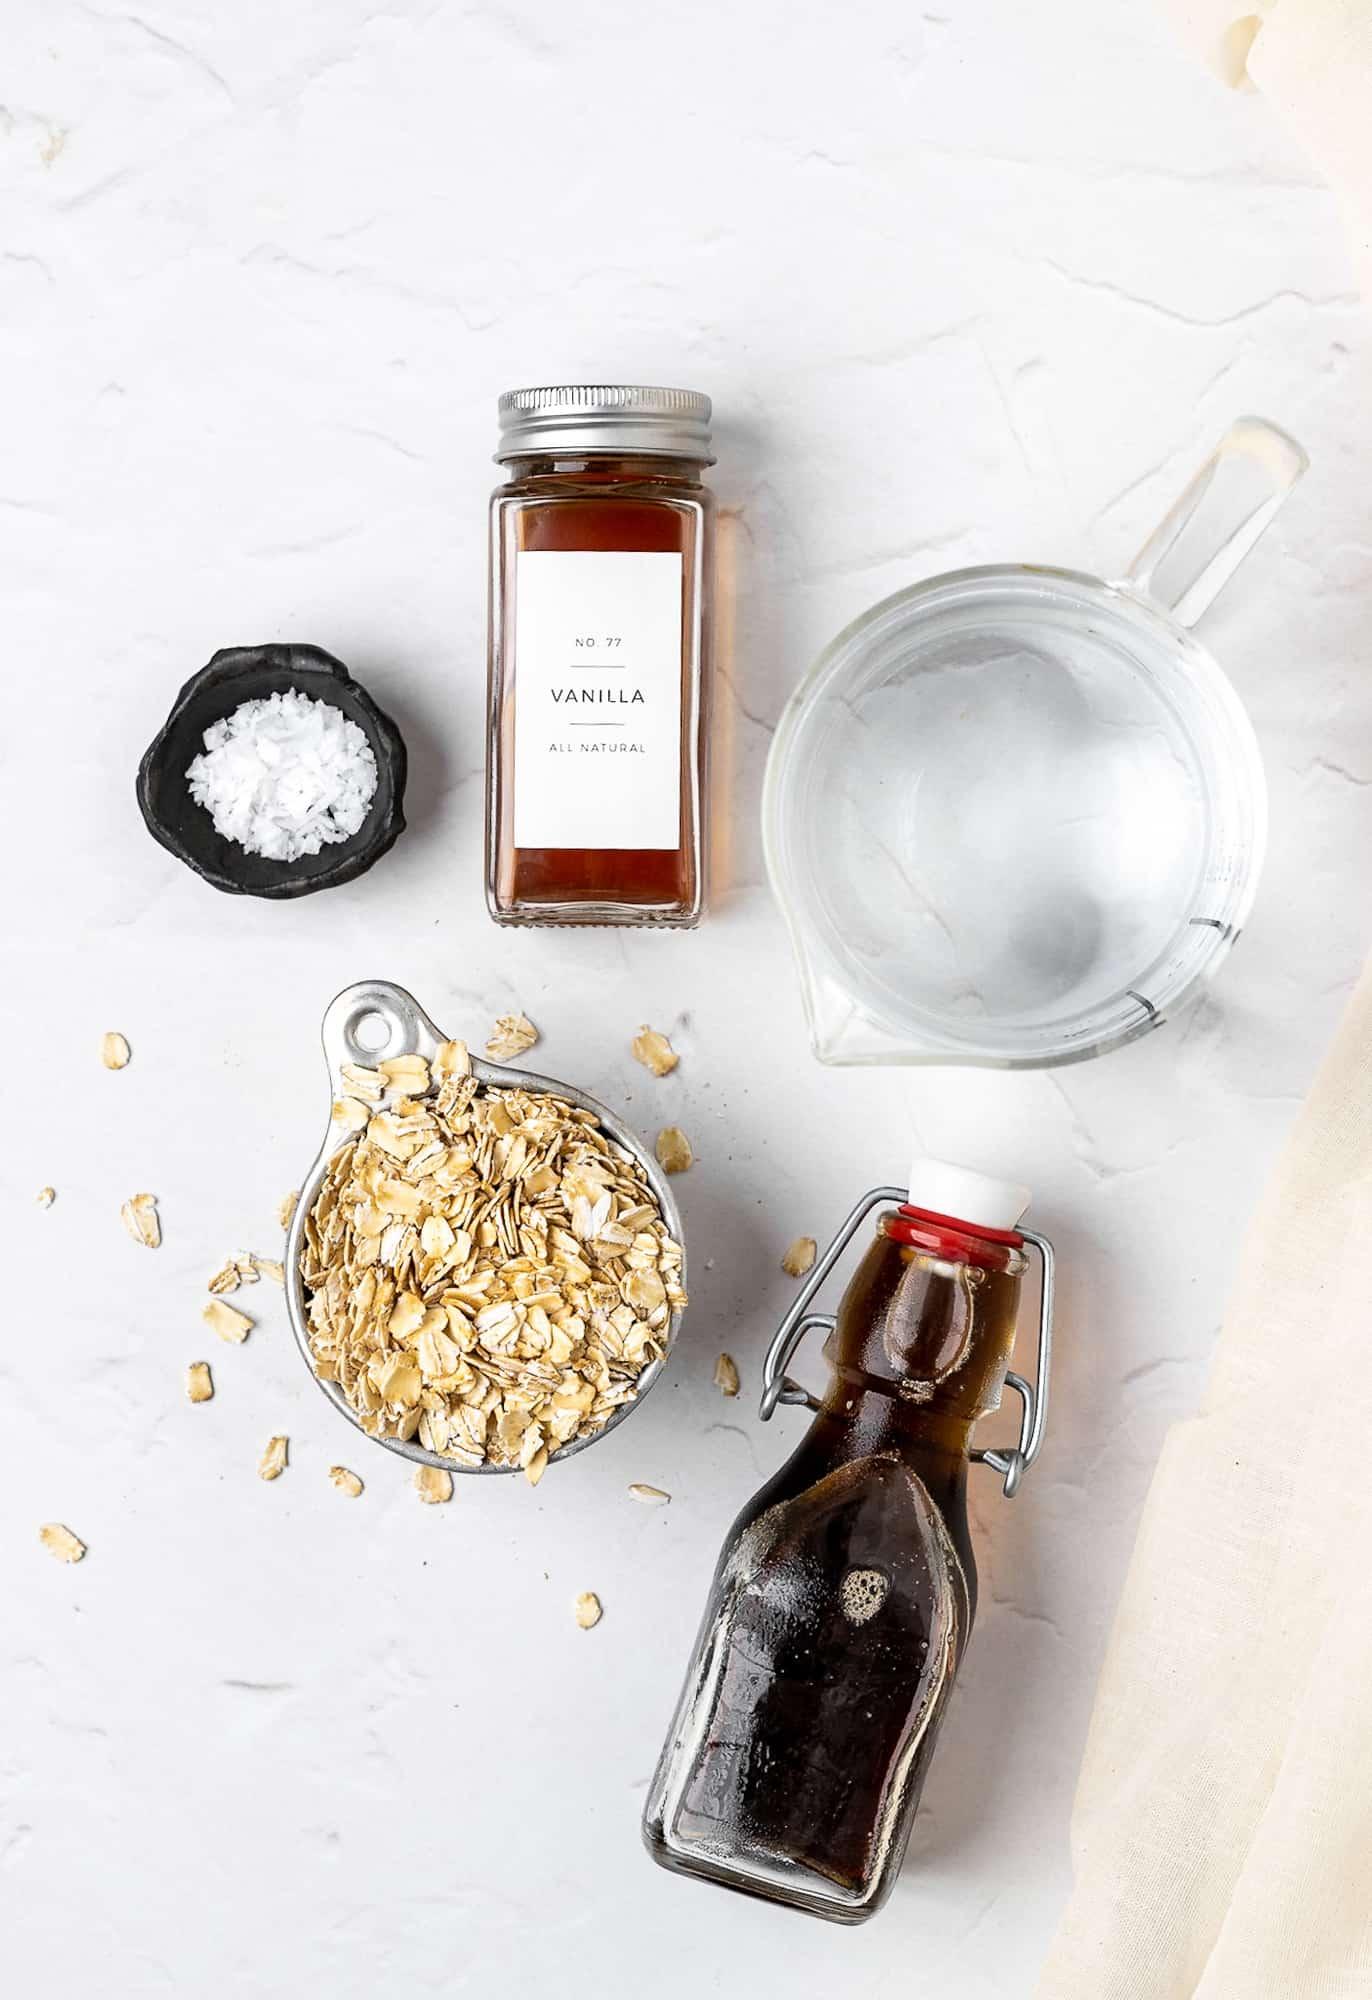 ingredients for homemade oat milk: oats. water, vanilla, maple syrup, sea salt